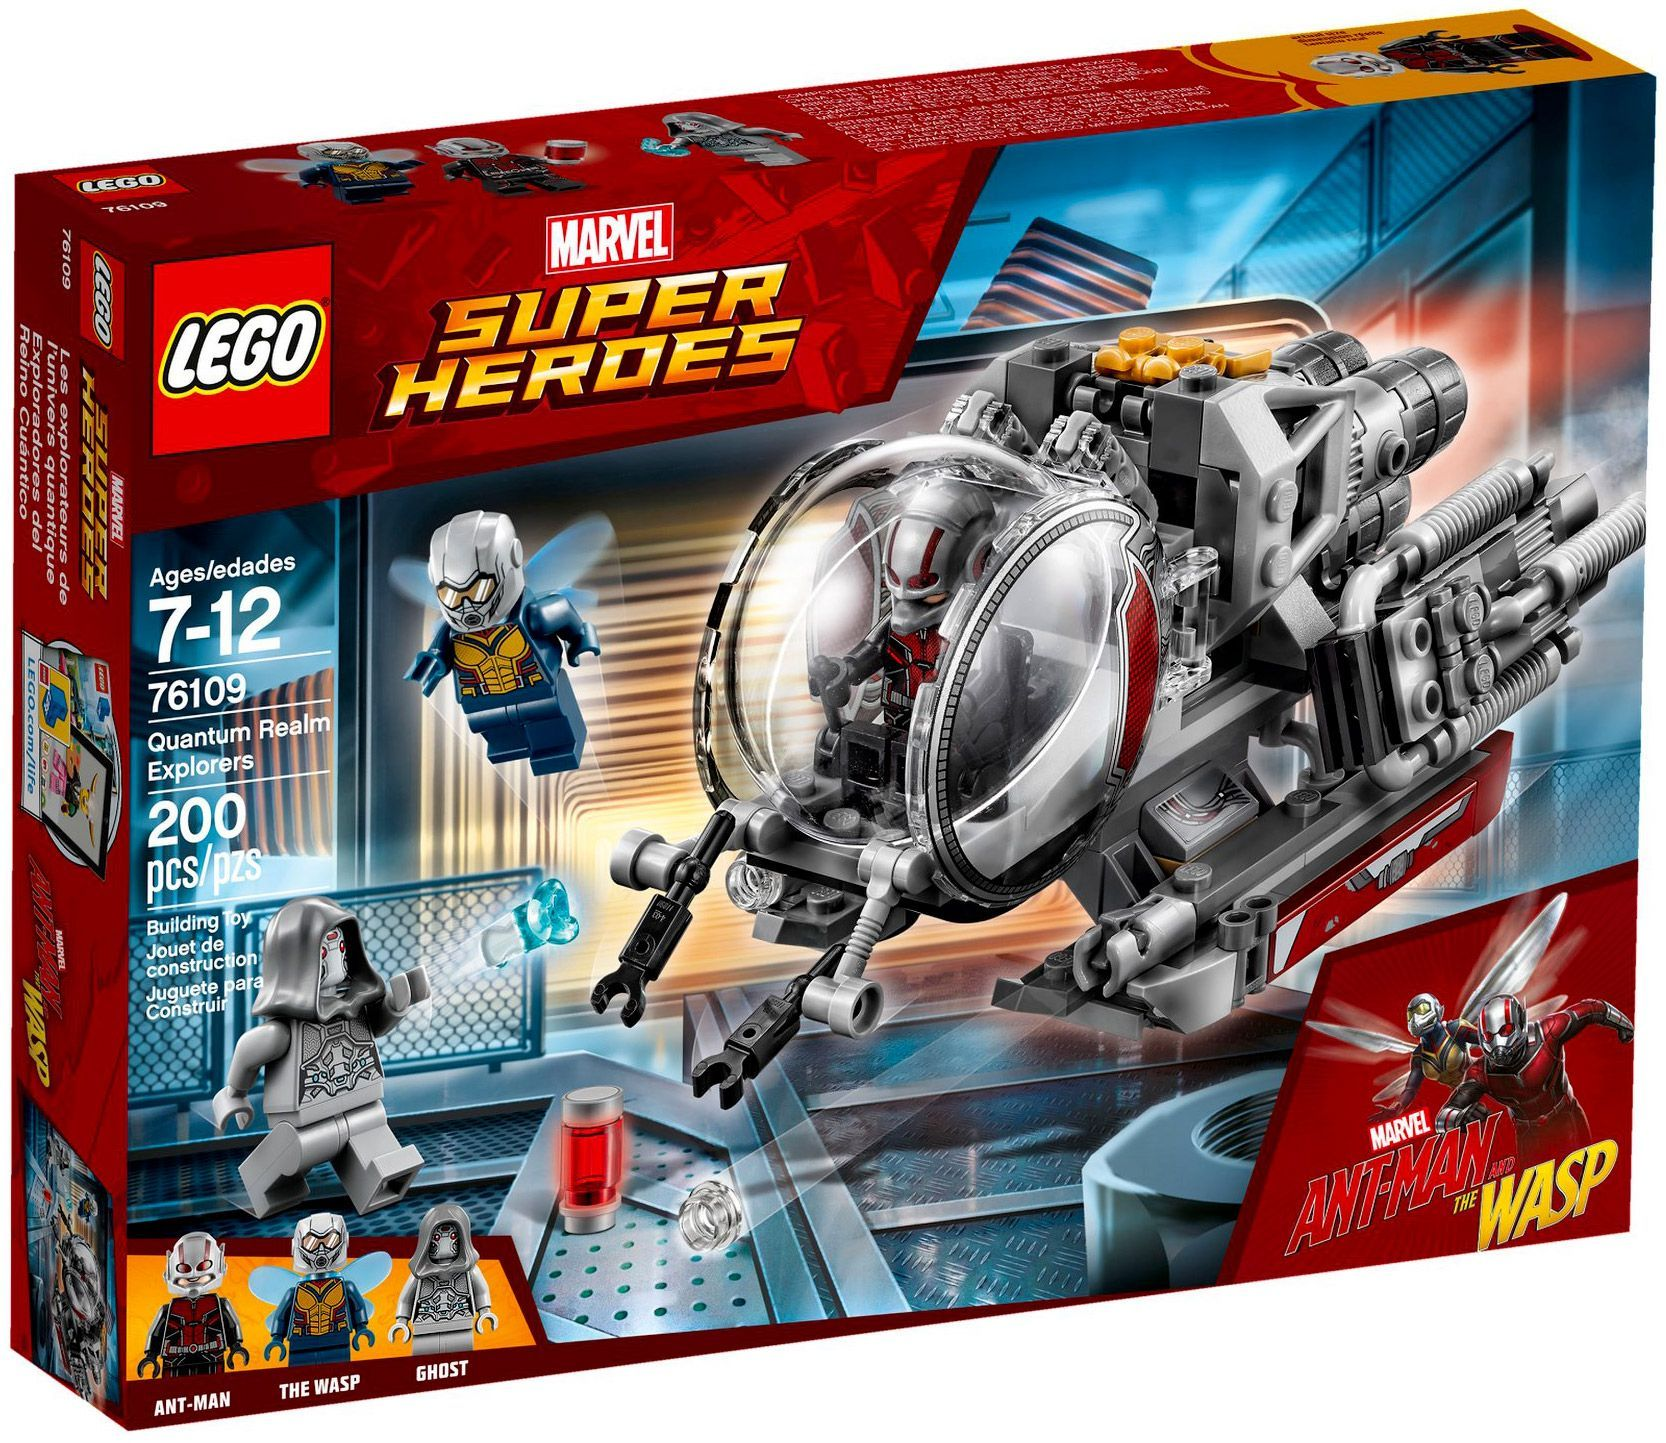 A Marvel La De Heroes Realmant 76109 Super Lego Découverte Quantum 6Y7gybf